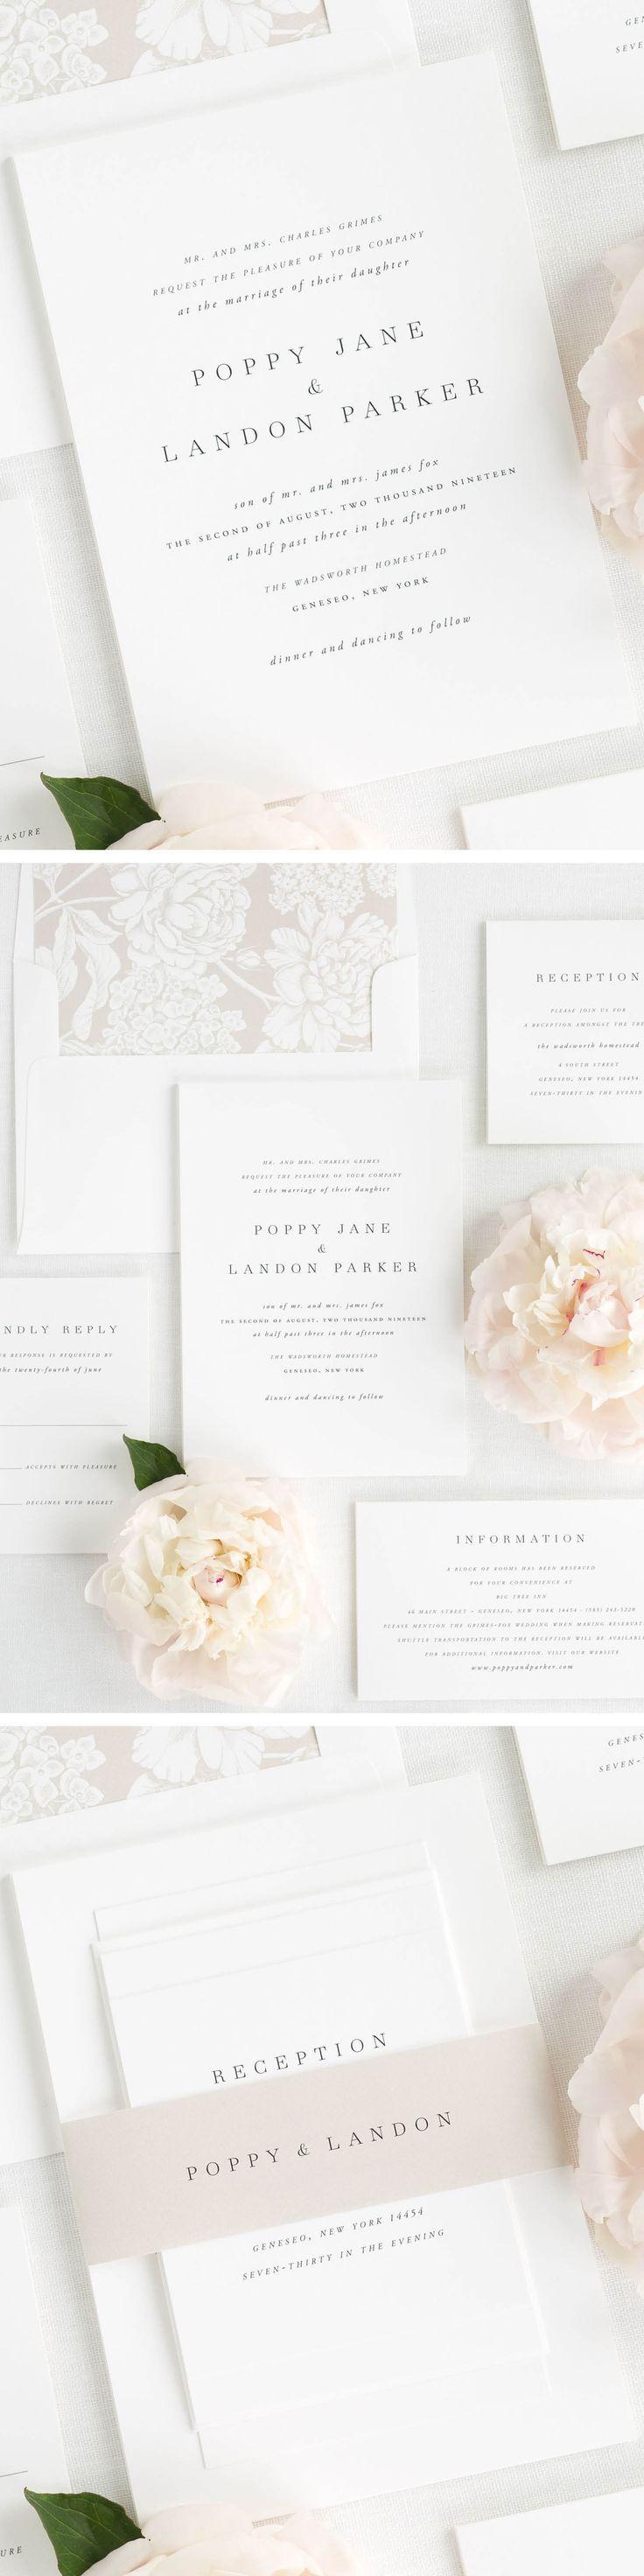 354 best Shine Wedding Invitations images on Pinterest A